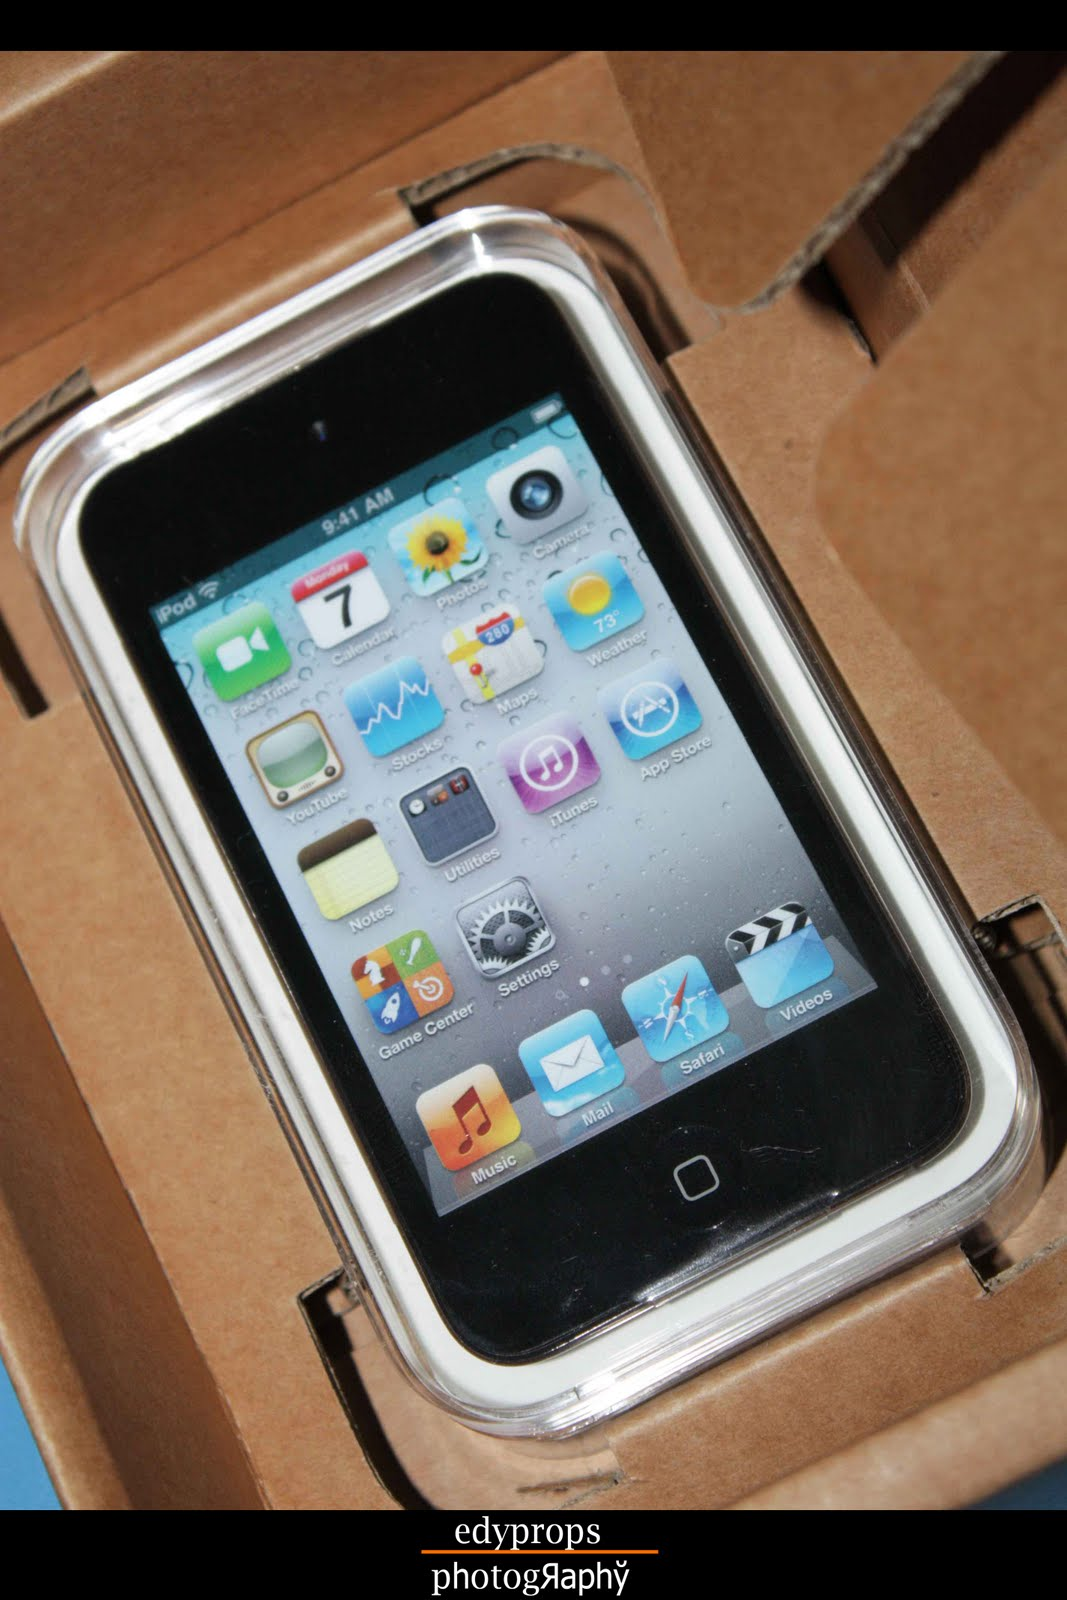 http://1.bp.blogspot.com/-2AAMp9j3dxU/TdEuDG_hfRI/AAAAAAAADEo/icDBU4focAE/s1600/ipod+touch.jpg